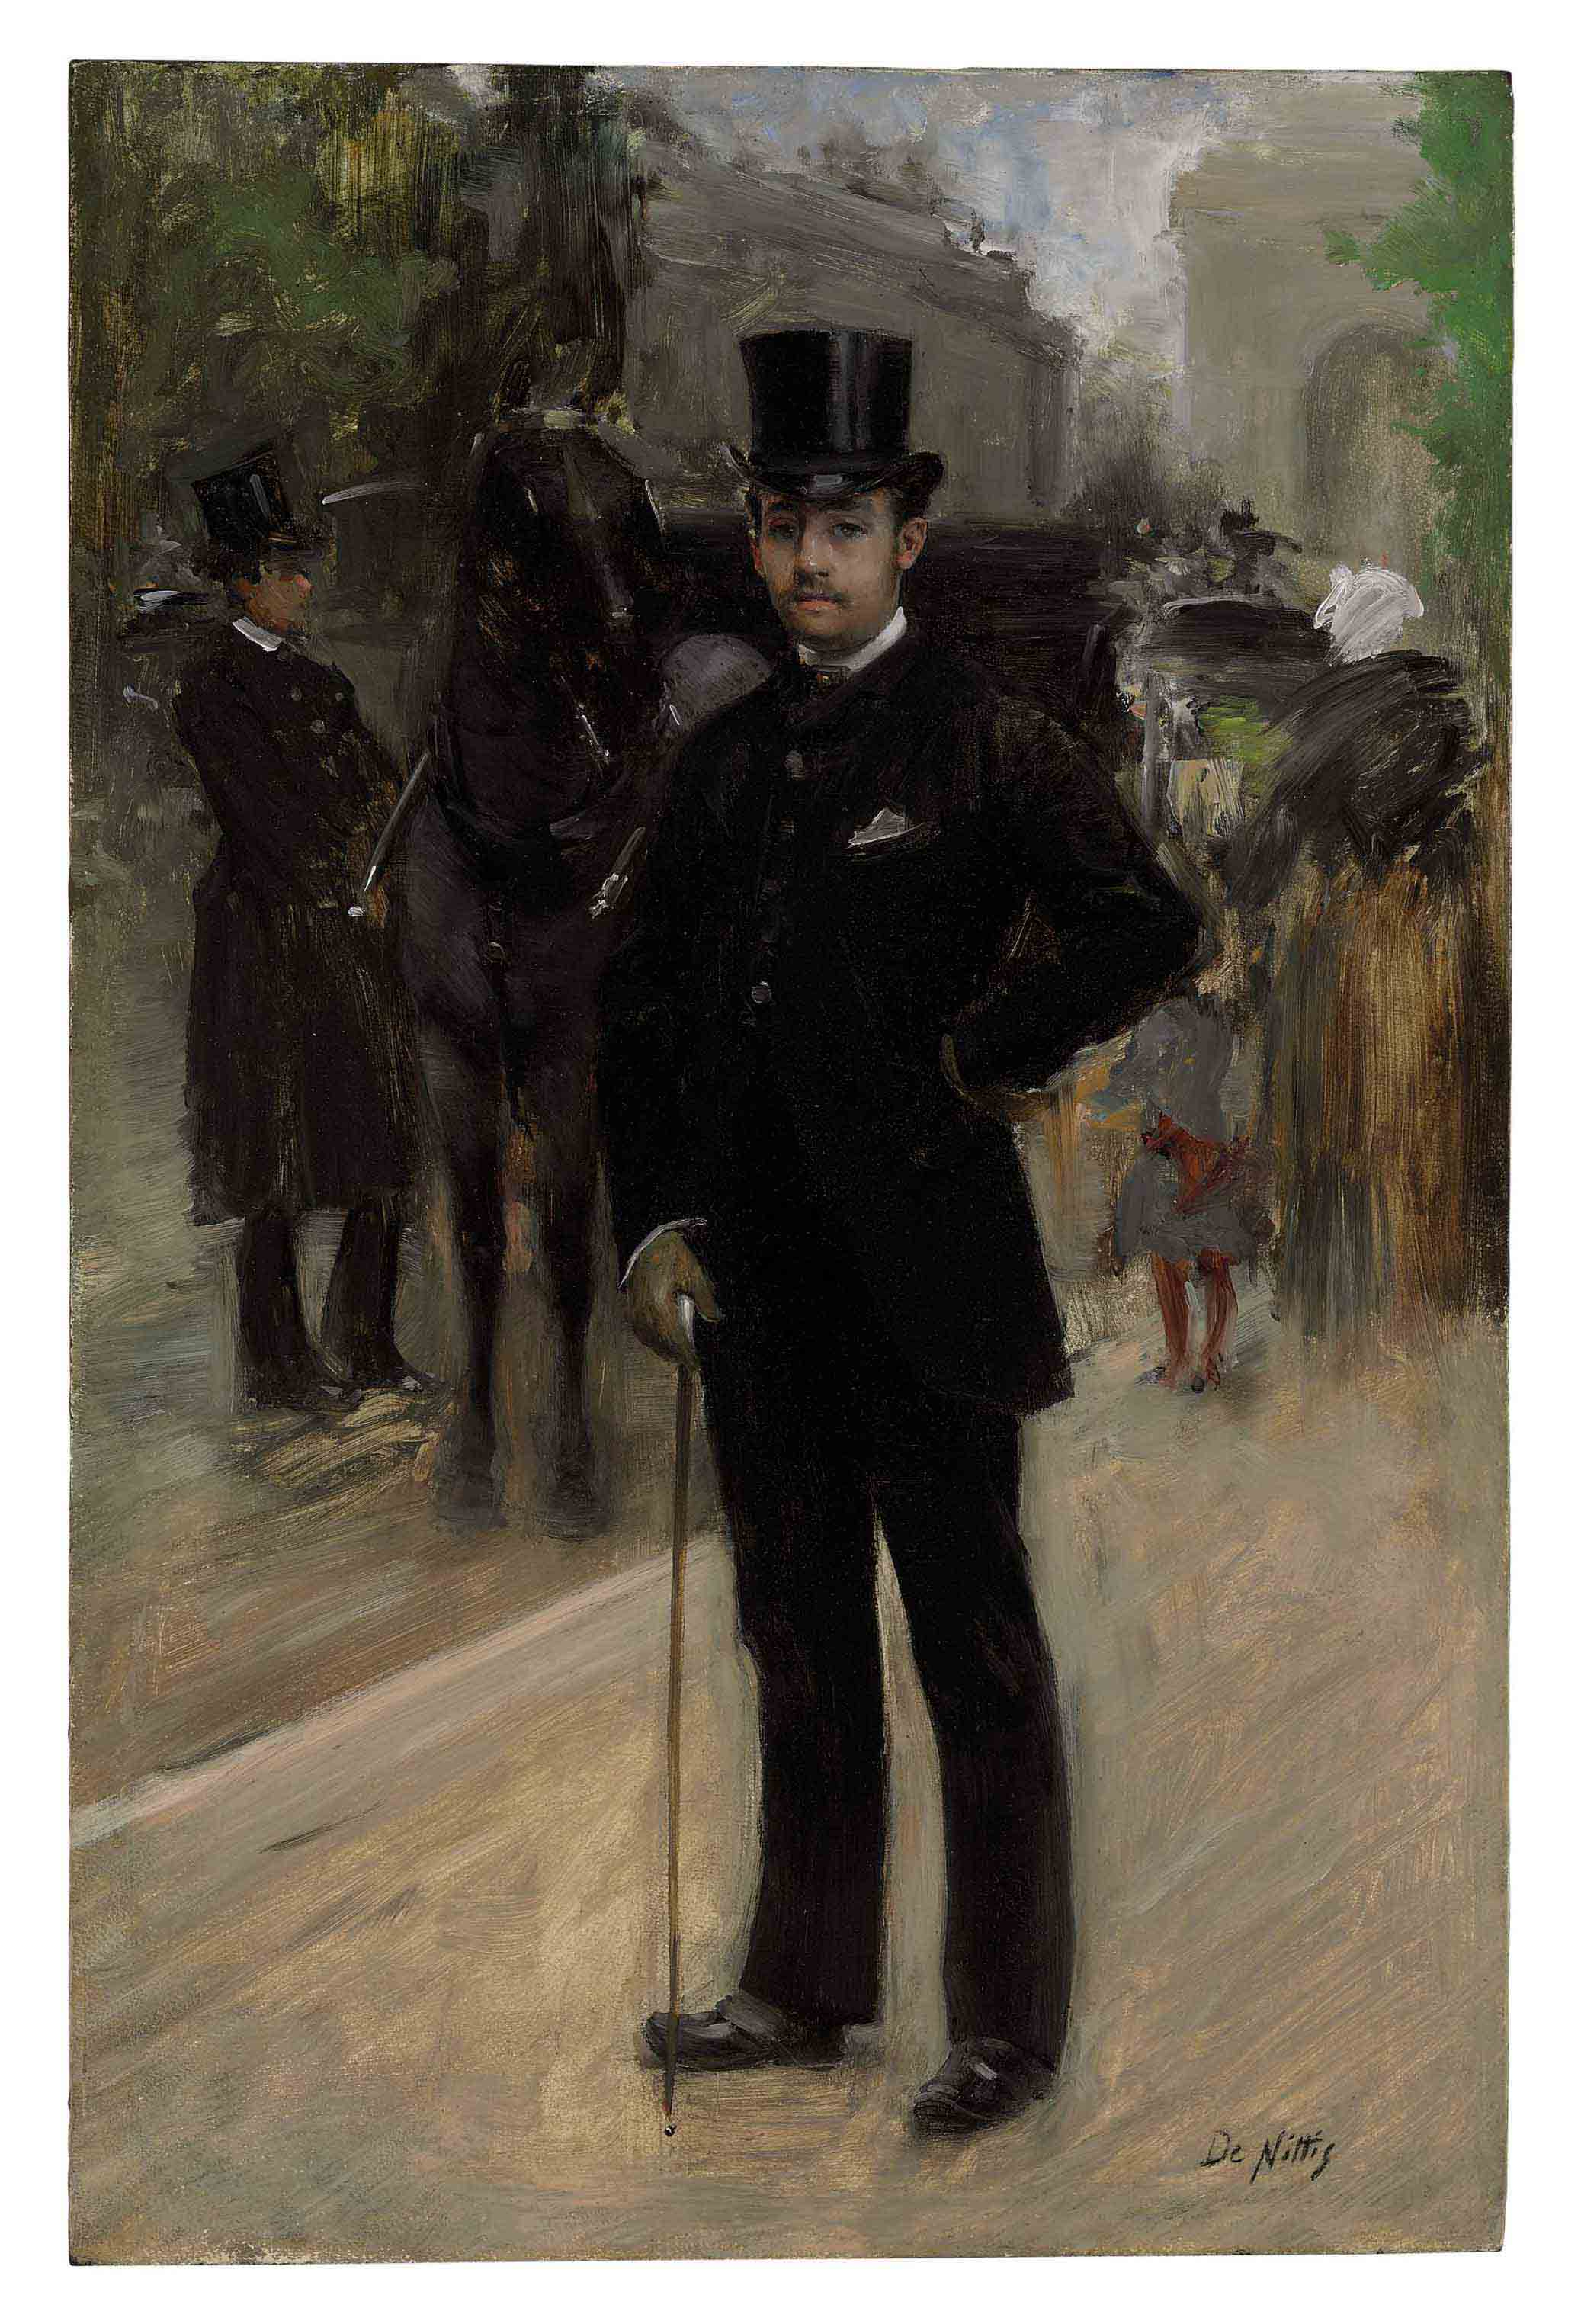 Portrait of a Gentleman on a Parisian Boulevard